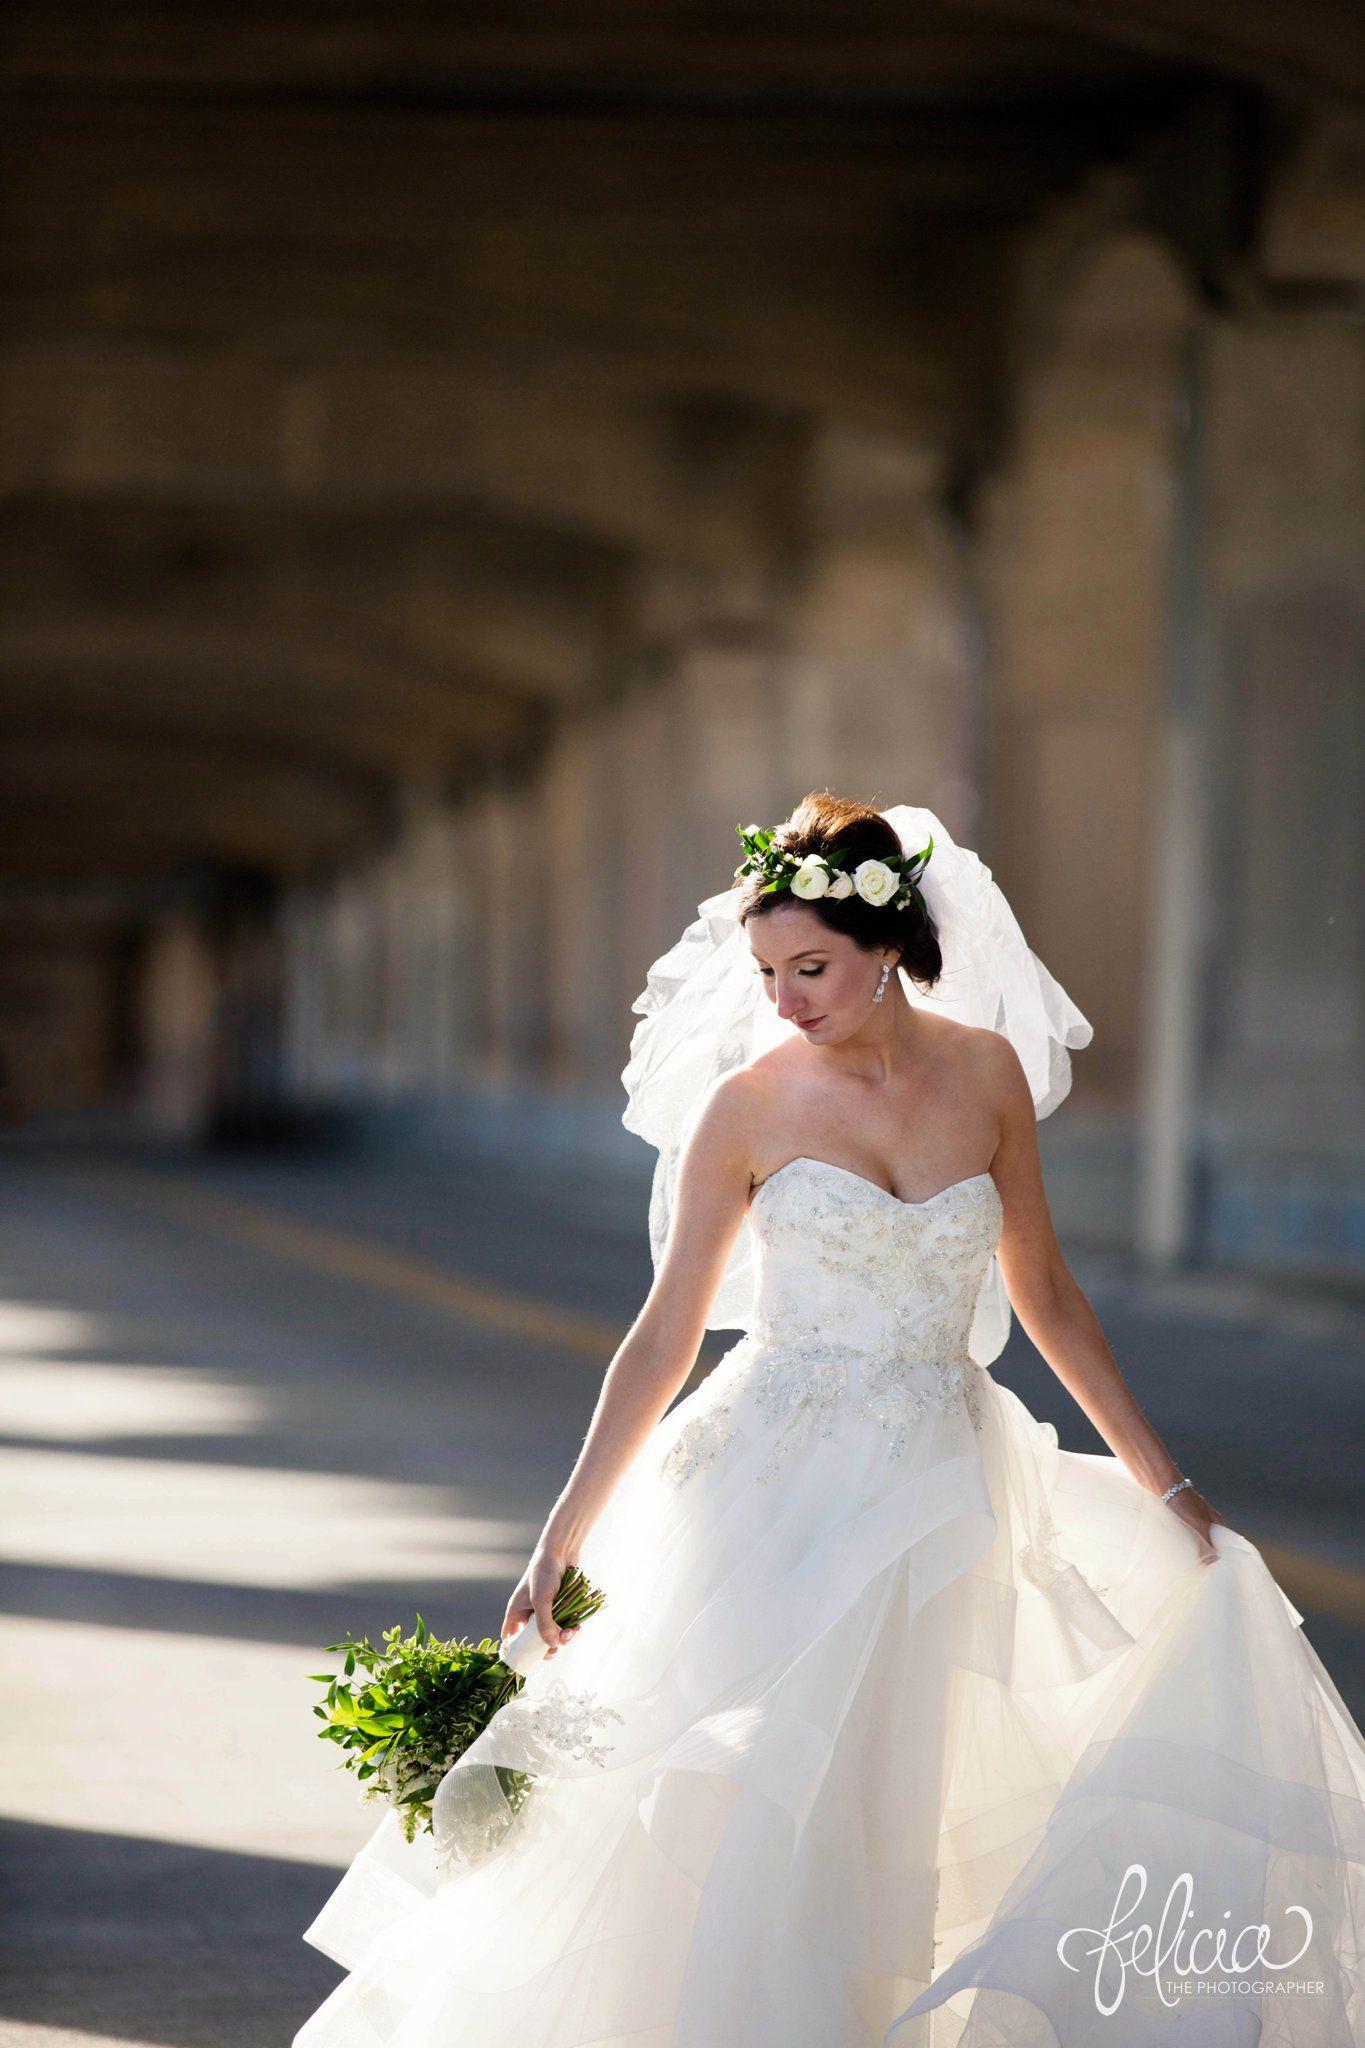 Ruthie bridal shoot bridal portraits and destination wedding bridal shoot felicia the photographer kansas city monique lhuillier wedding gown urban ombrellifo Choice Image